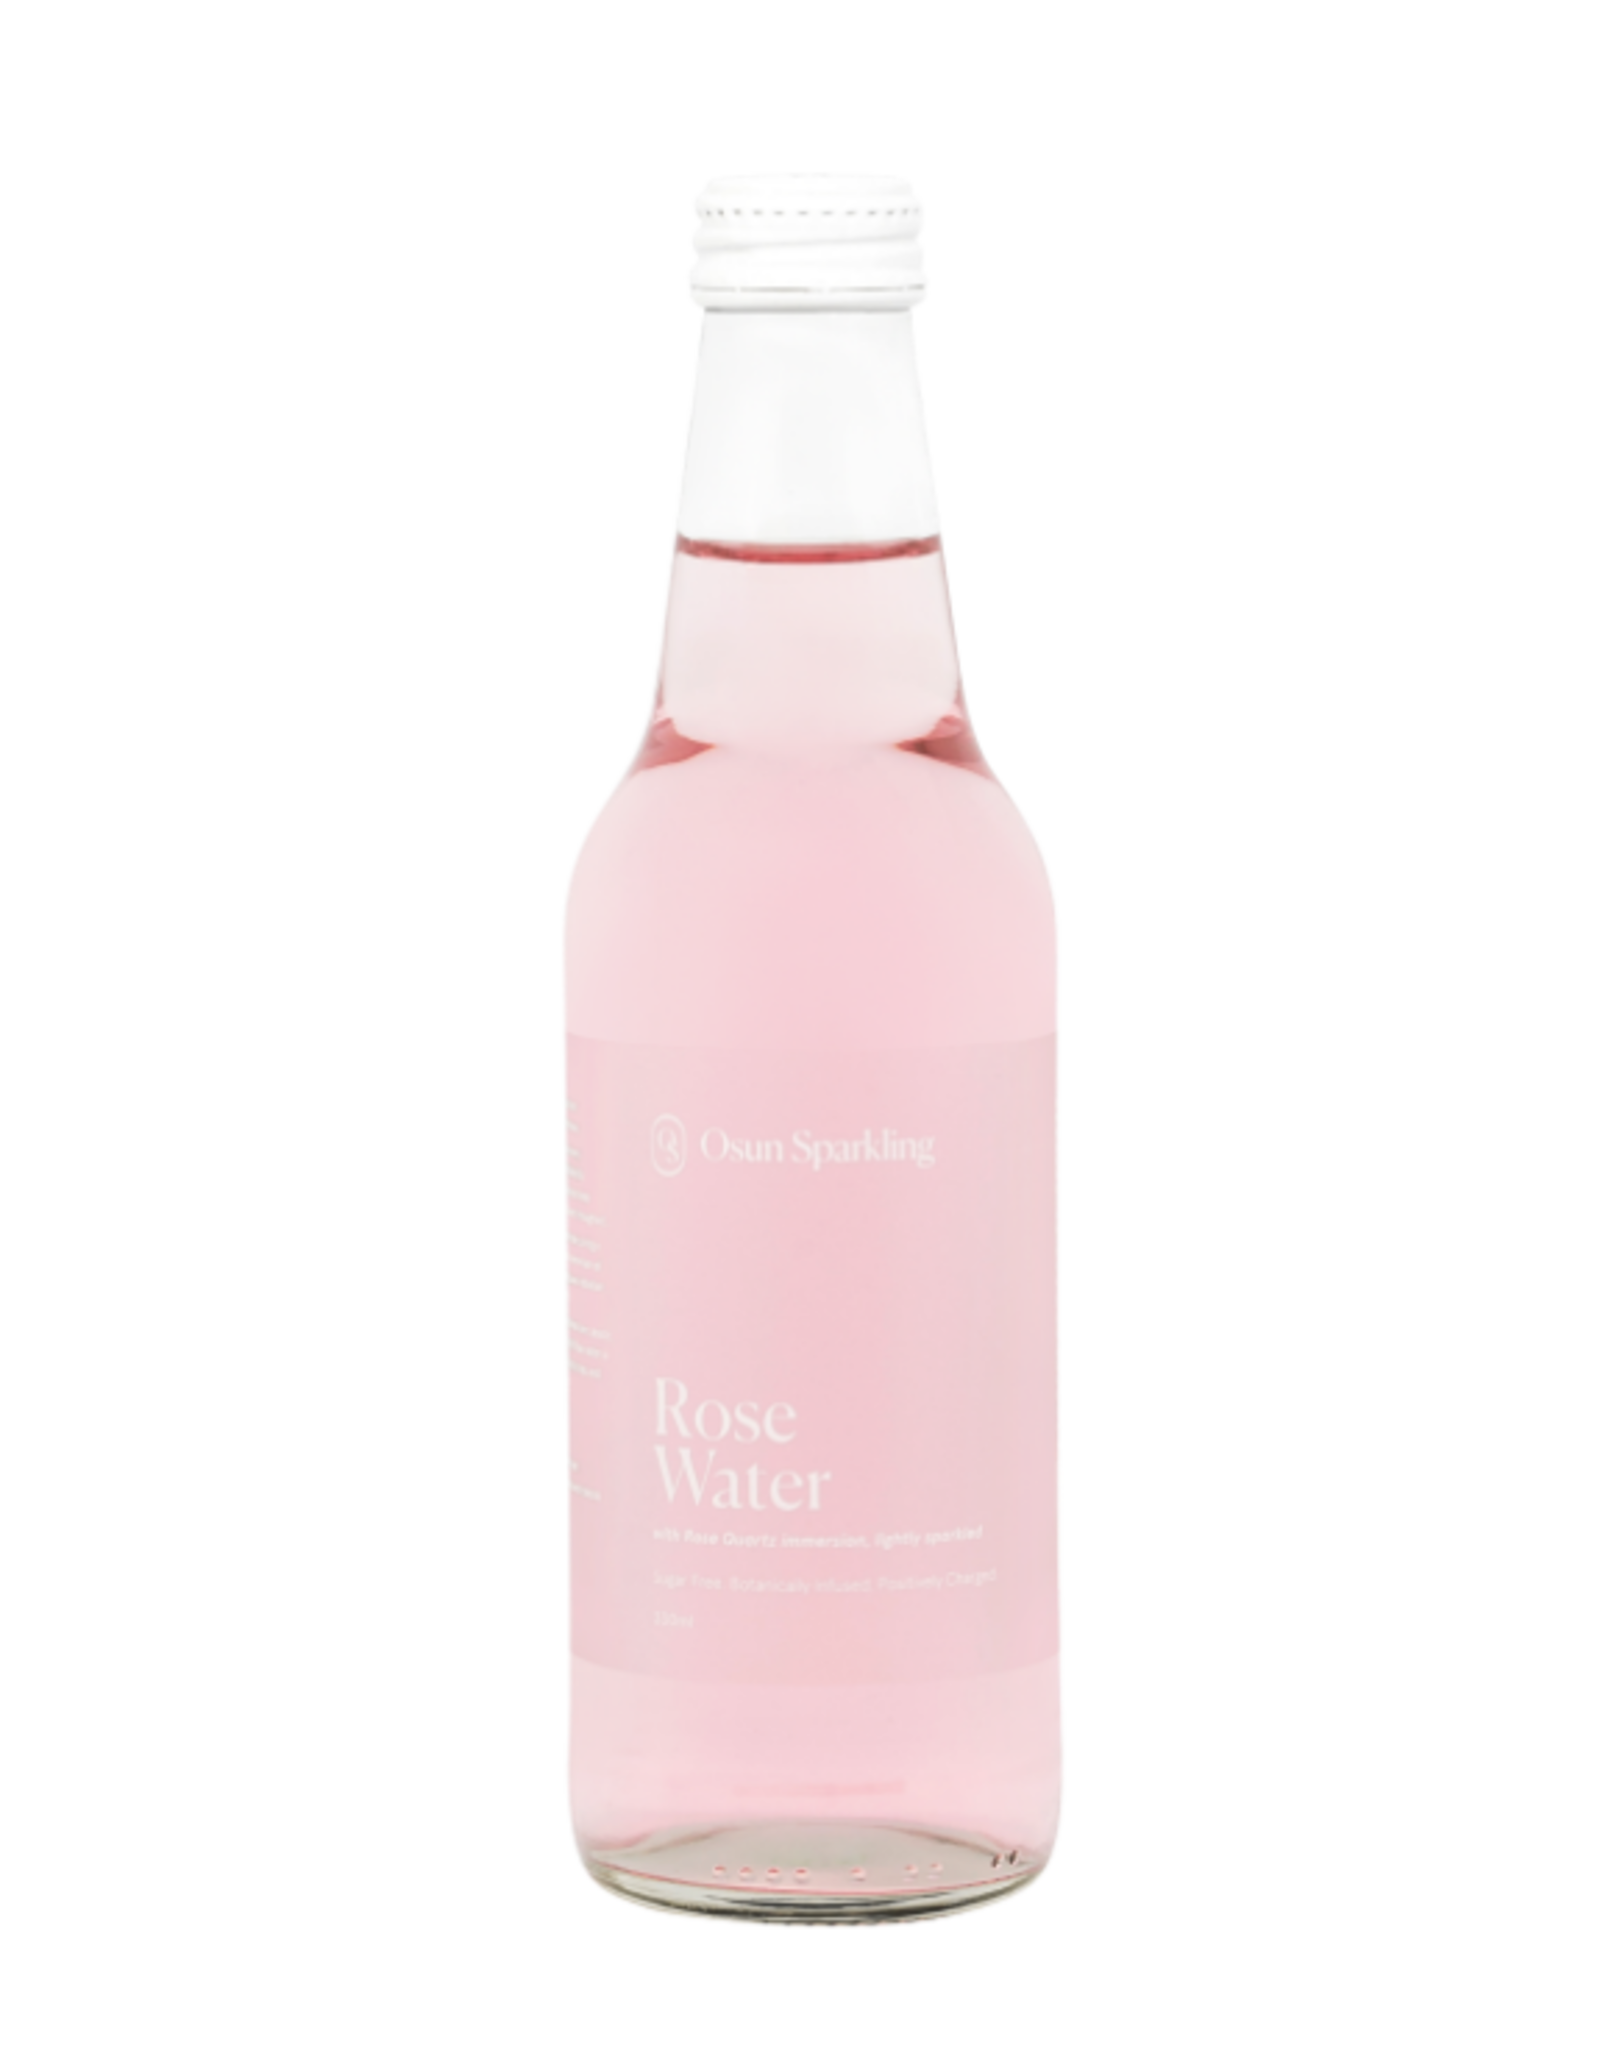 Osun Sparkling Rose Sparkling Water 330ml